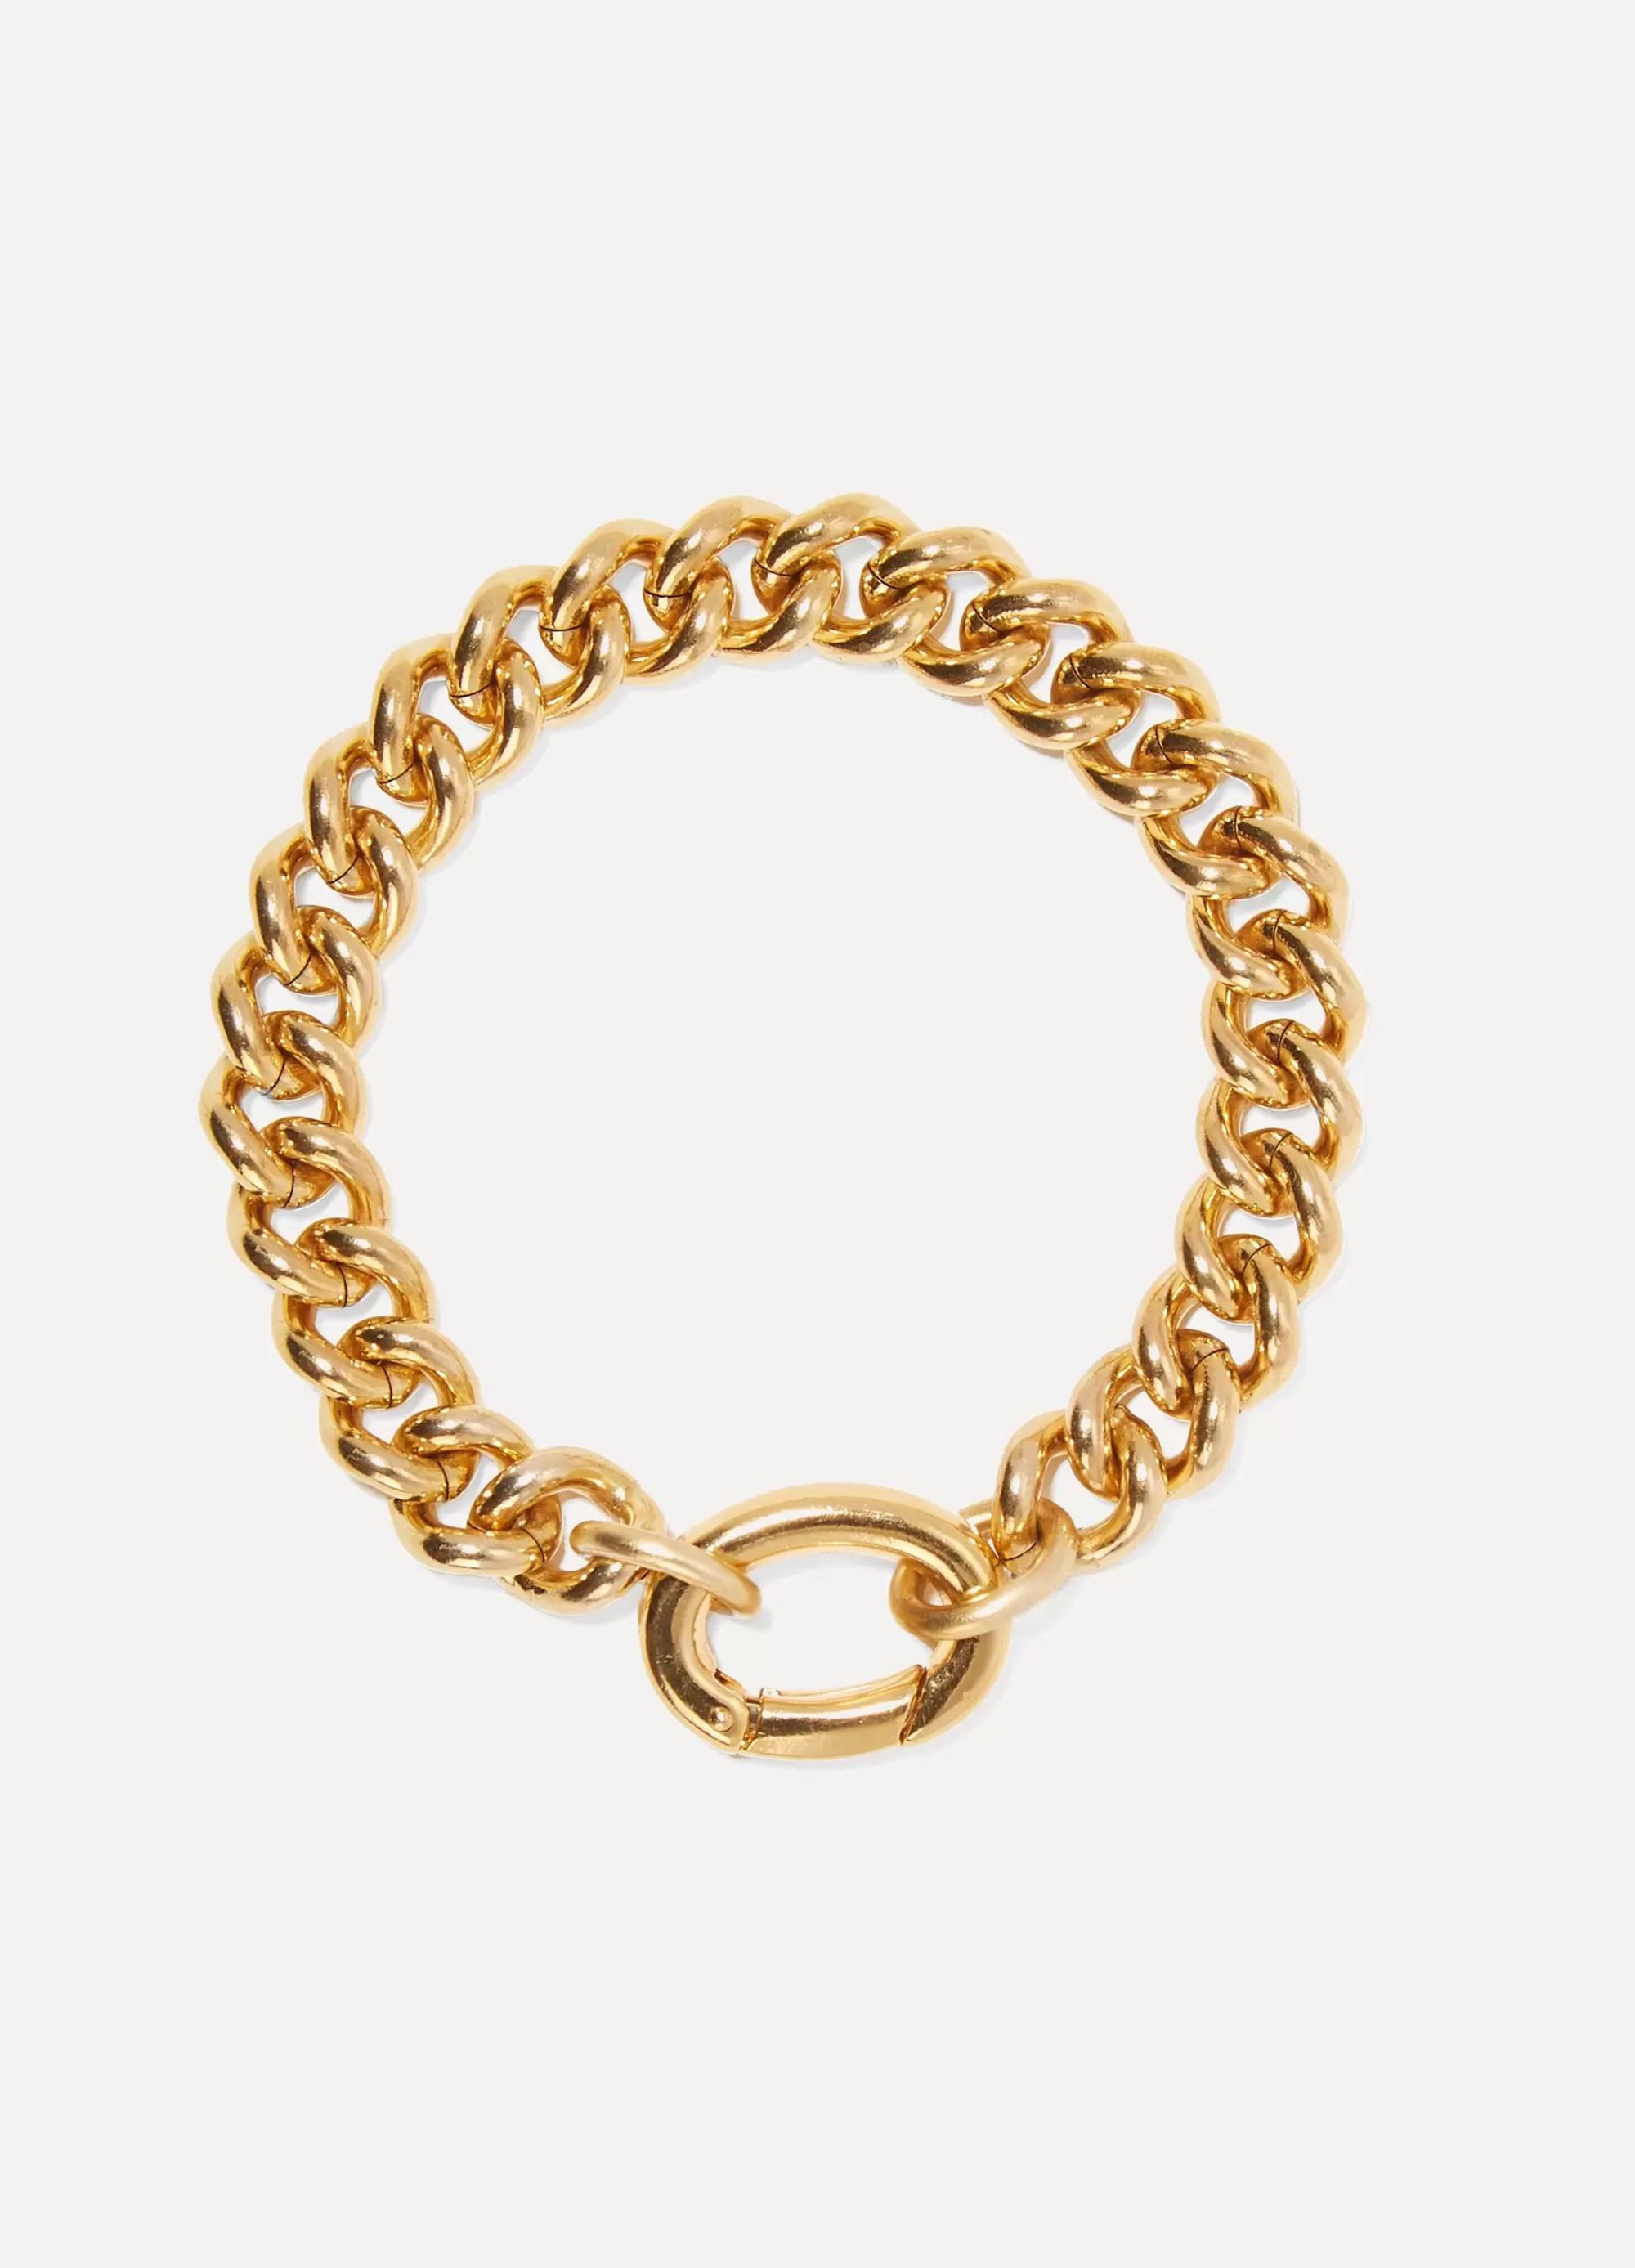 Laura Lombardi Presa gold-tone bracelet